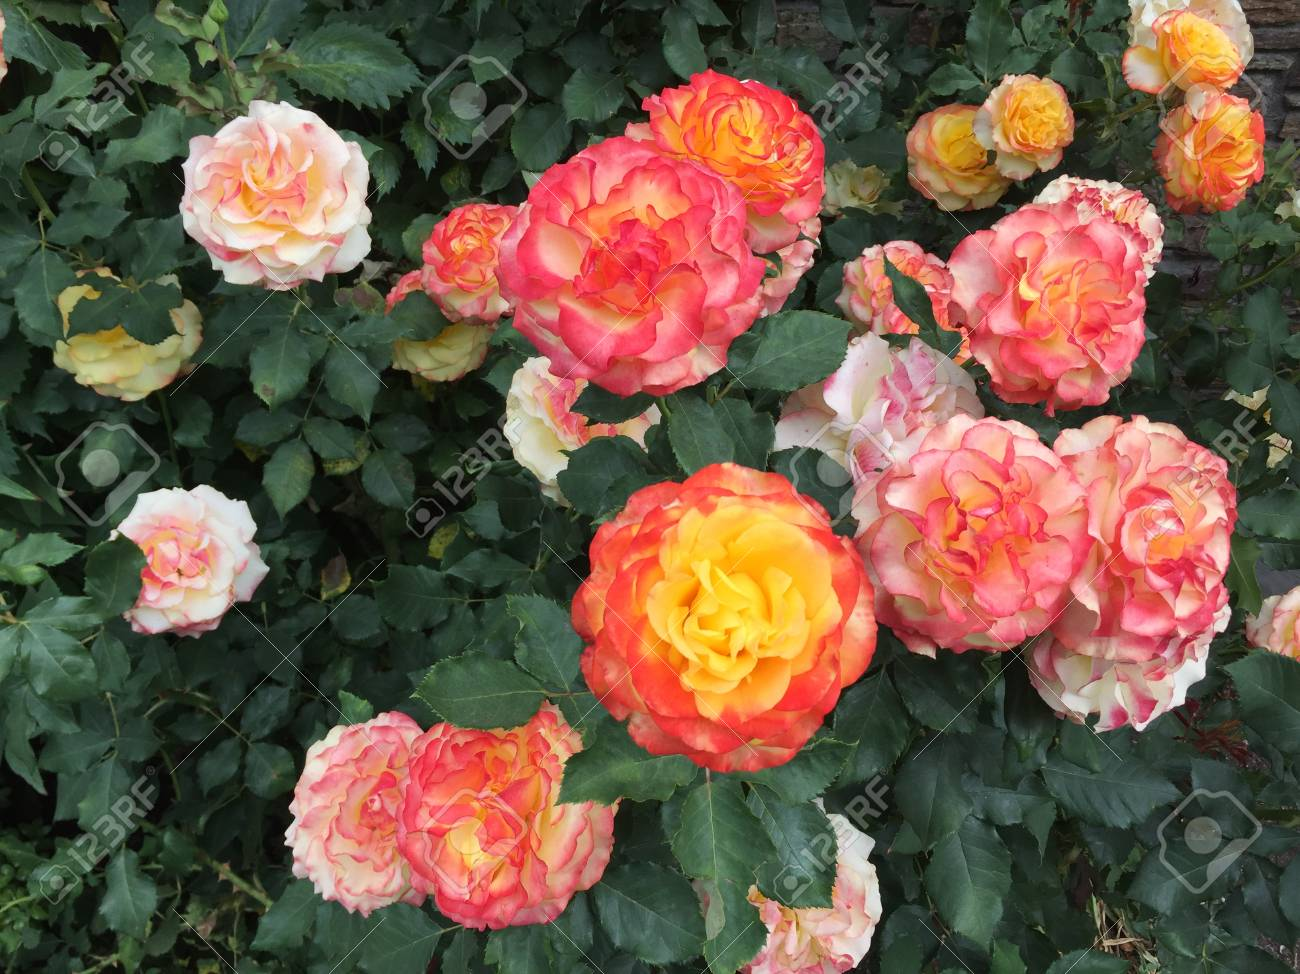 Romantic beautiful flowers in garden stock photo picture and romantic beautiful flowers in garden stock photo 101907519 izmirmasajfo